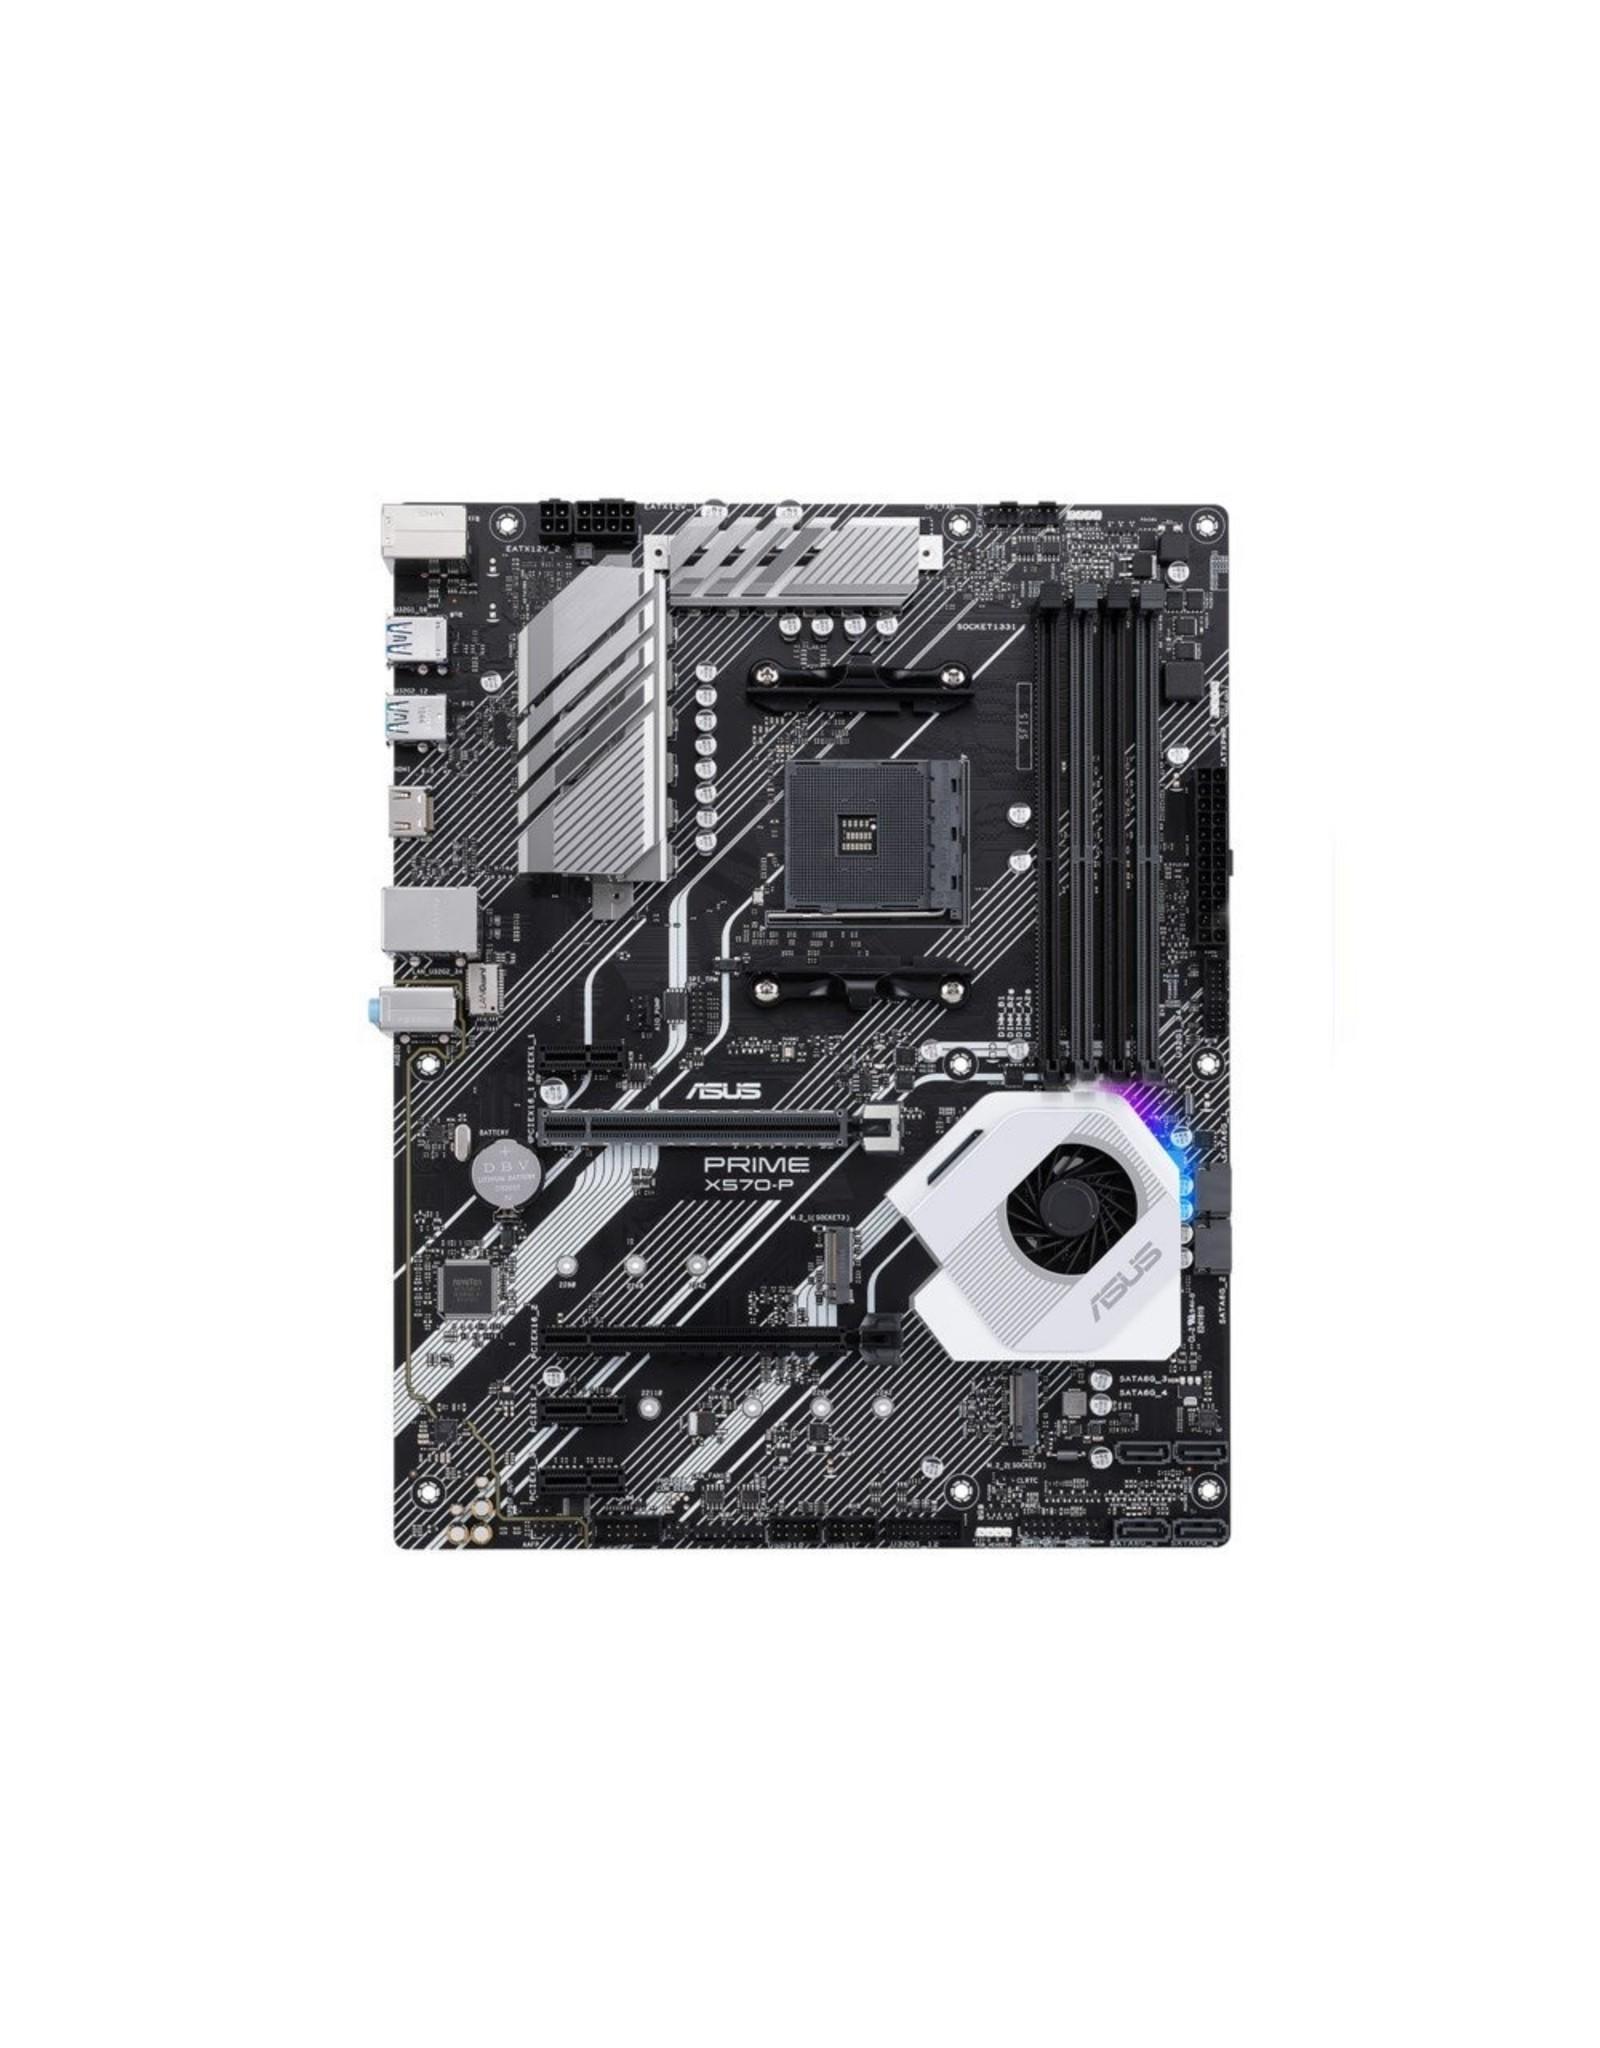 Asus MB ASUS Prime X570-P Socket AM4 ATX AMD X570